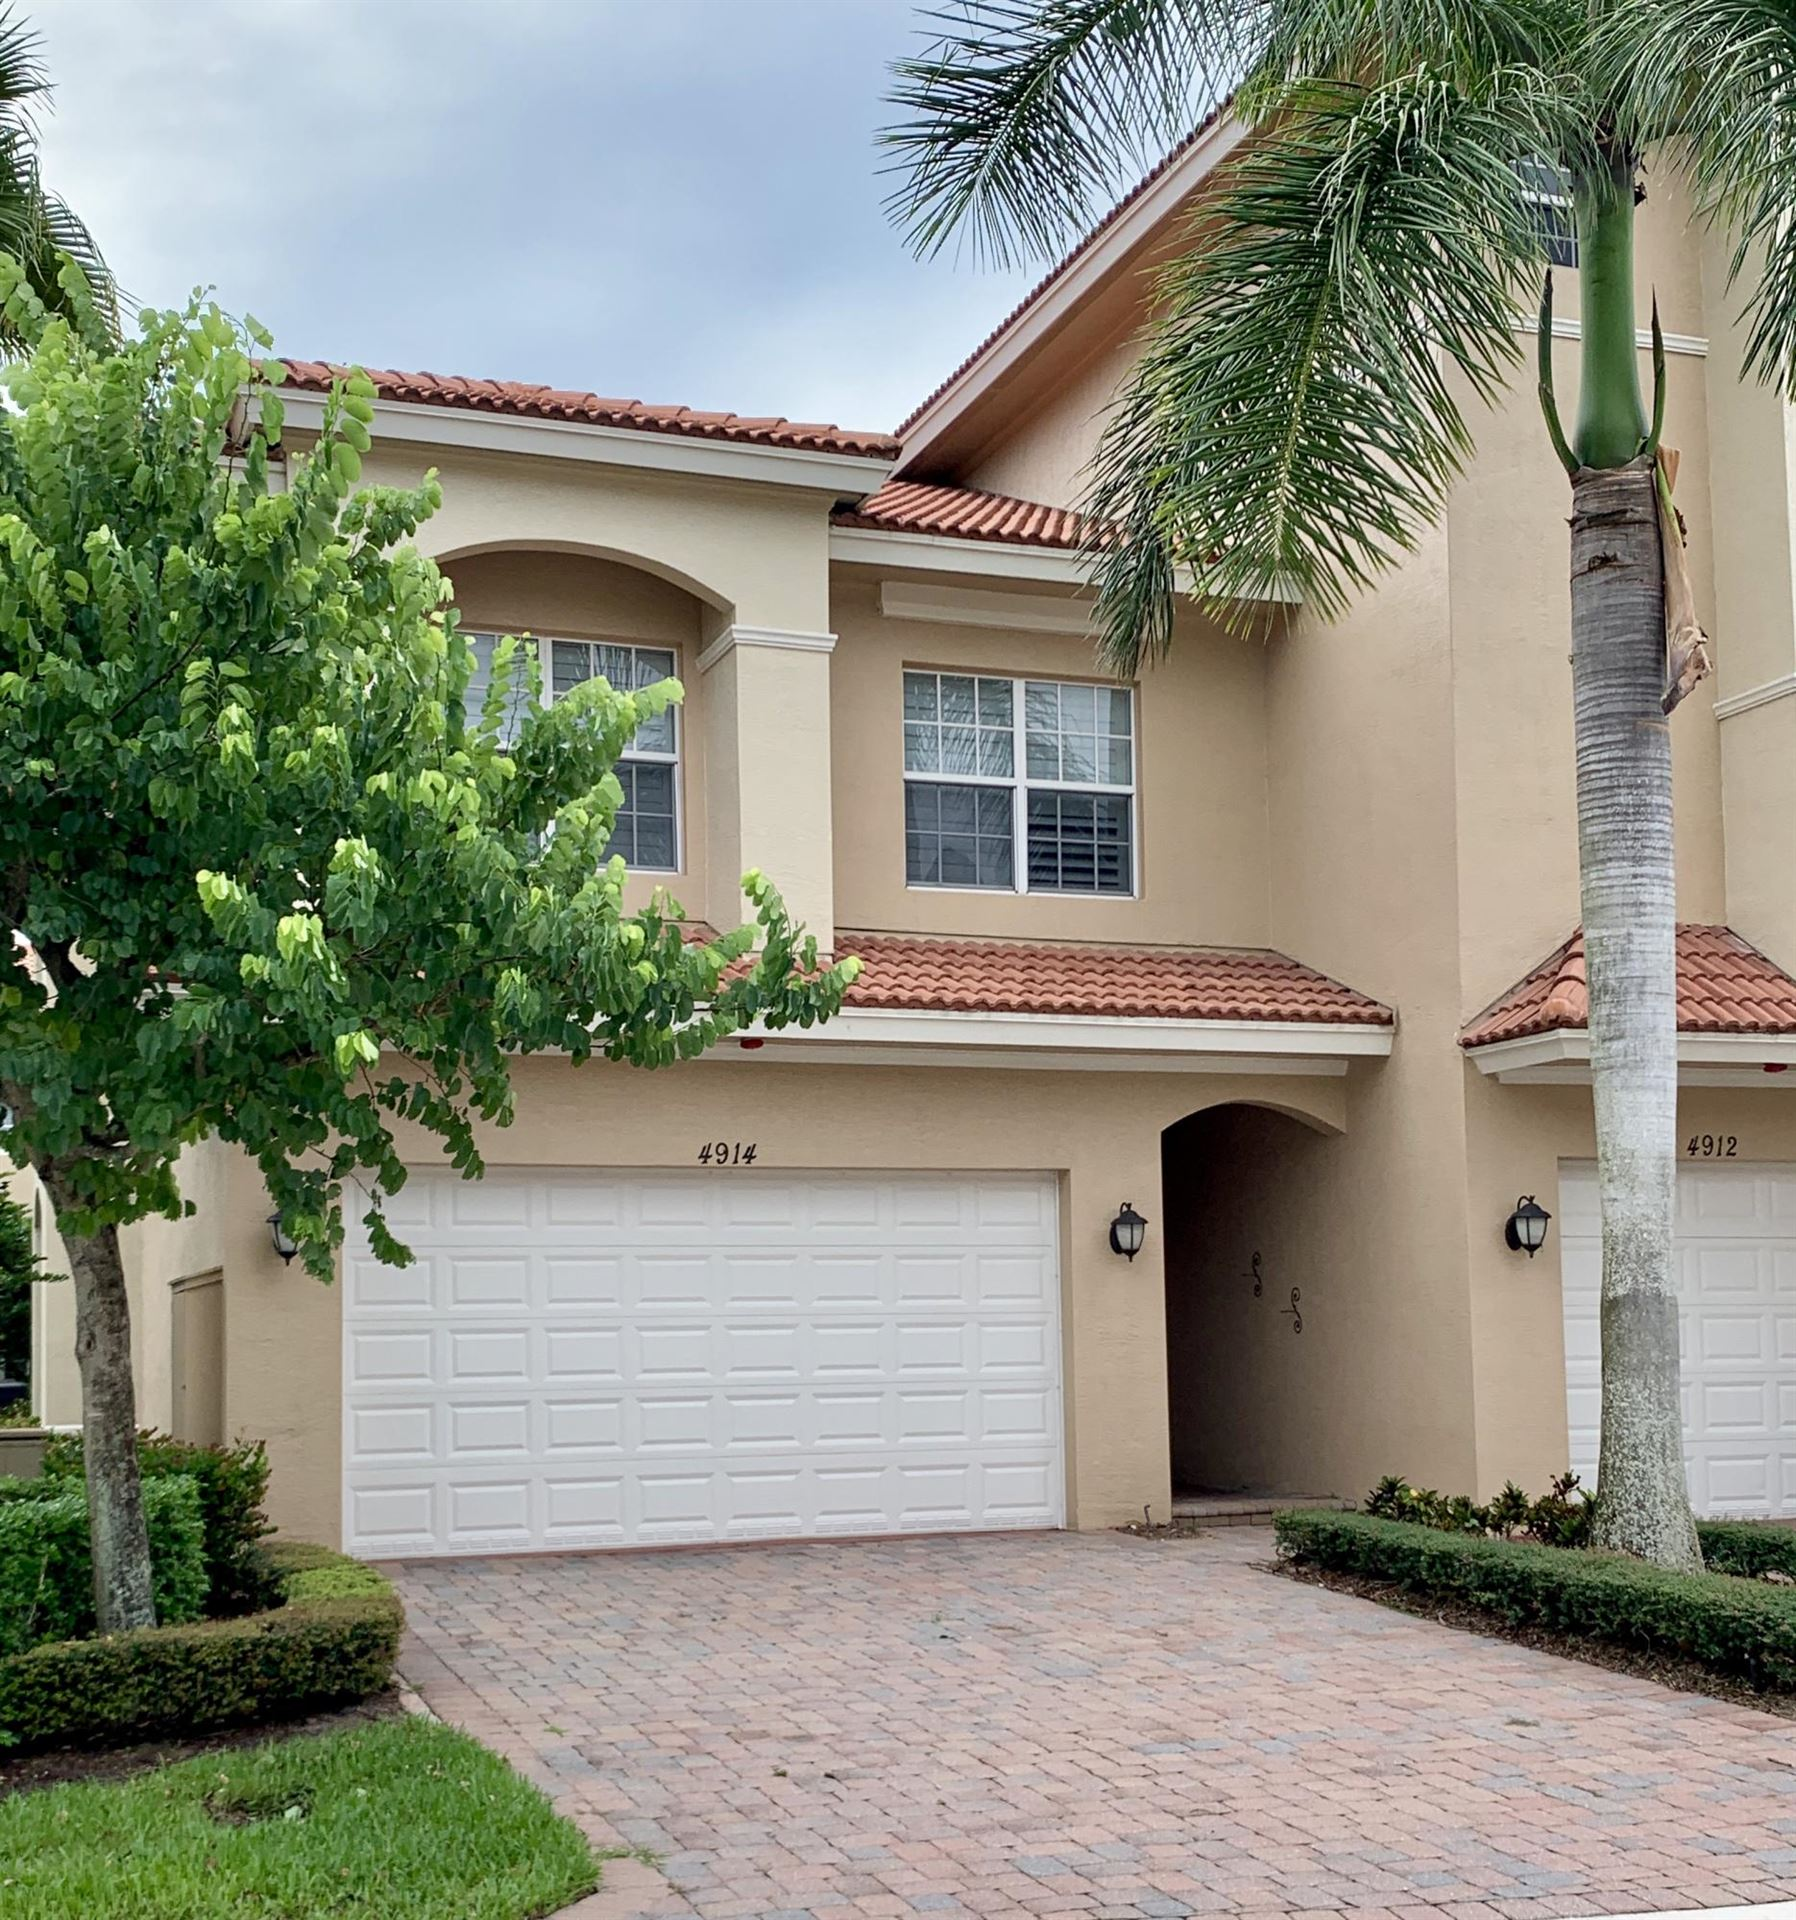 Photo of 4914 Vine Cliff Way E, Palm Beach Gardens, FL 33418 (MLS # RX-10747145)